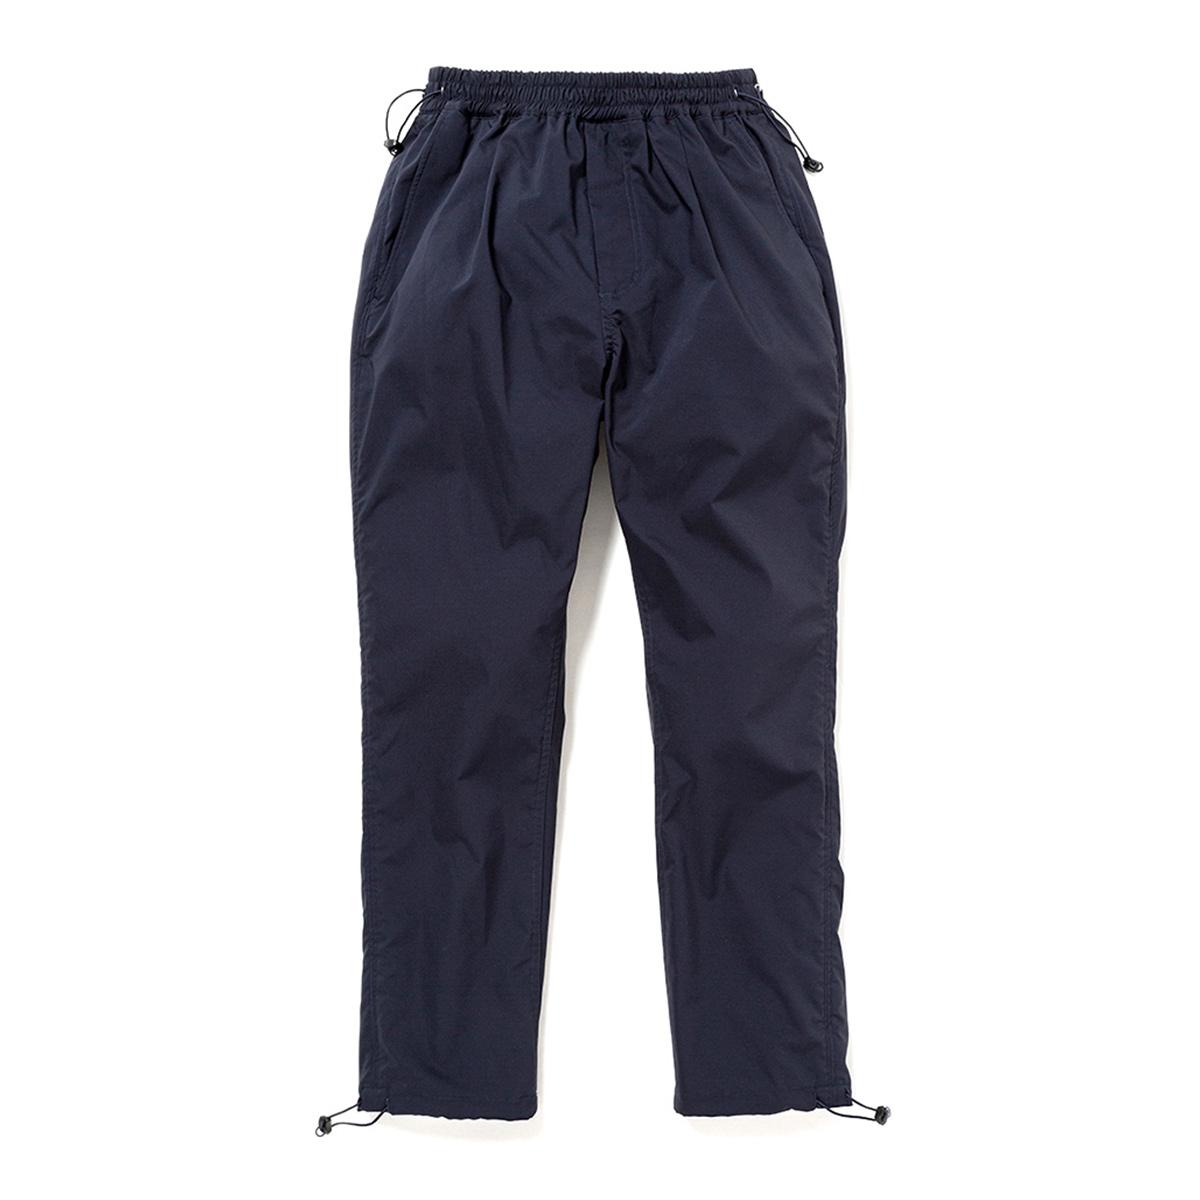 nonnative / TROOPER EASY PANTS POLY TWILL Pliantex® (Navy)